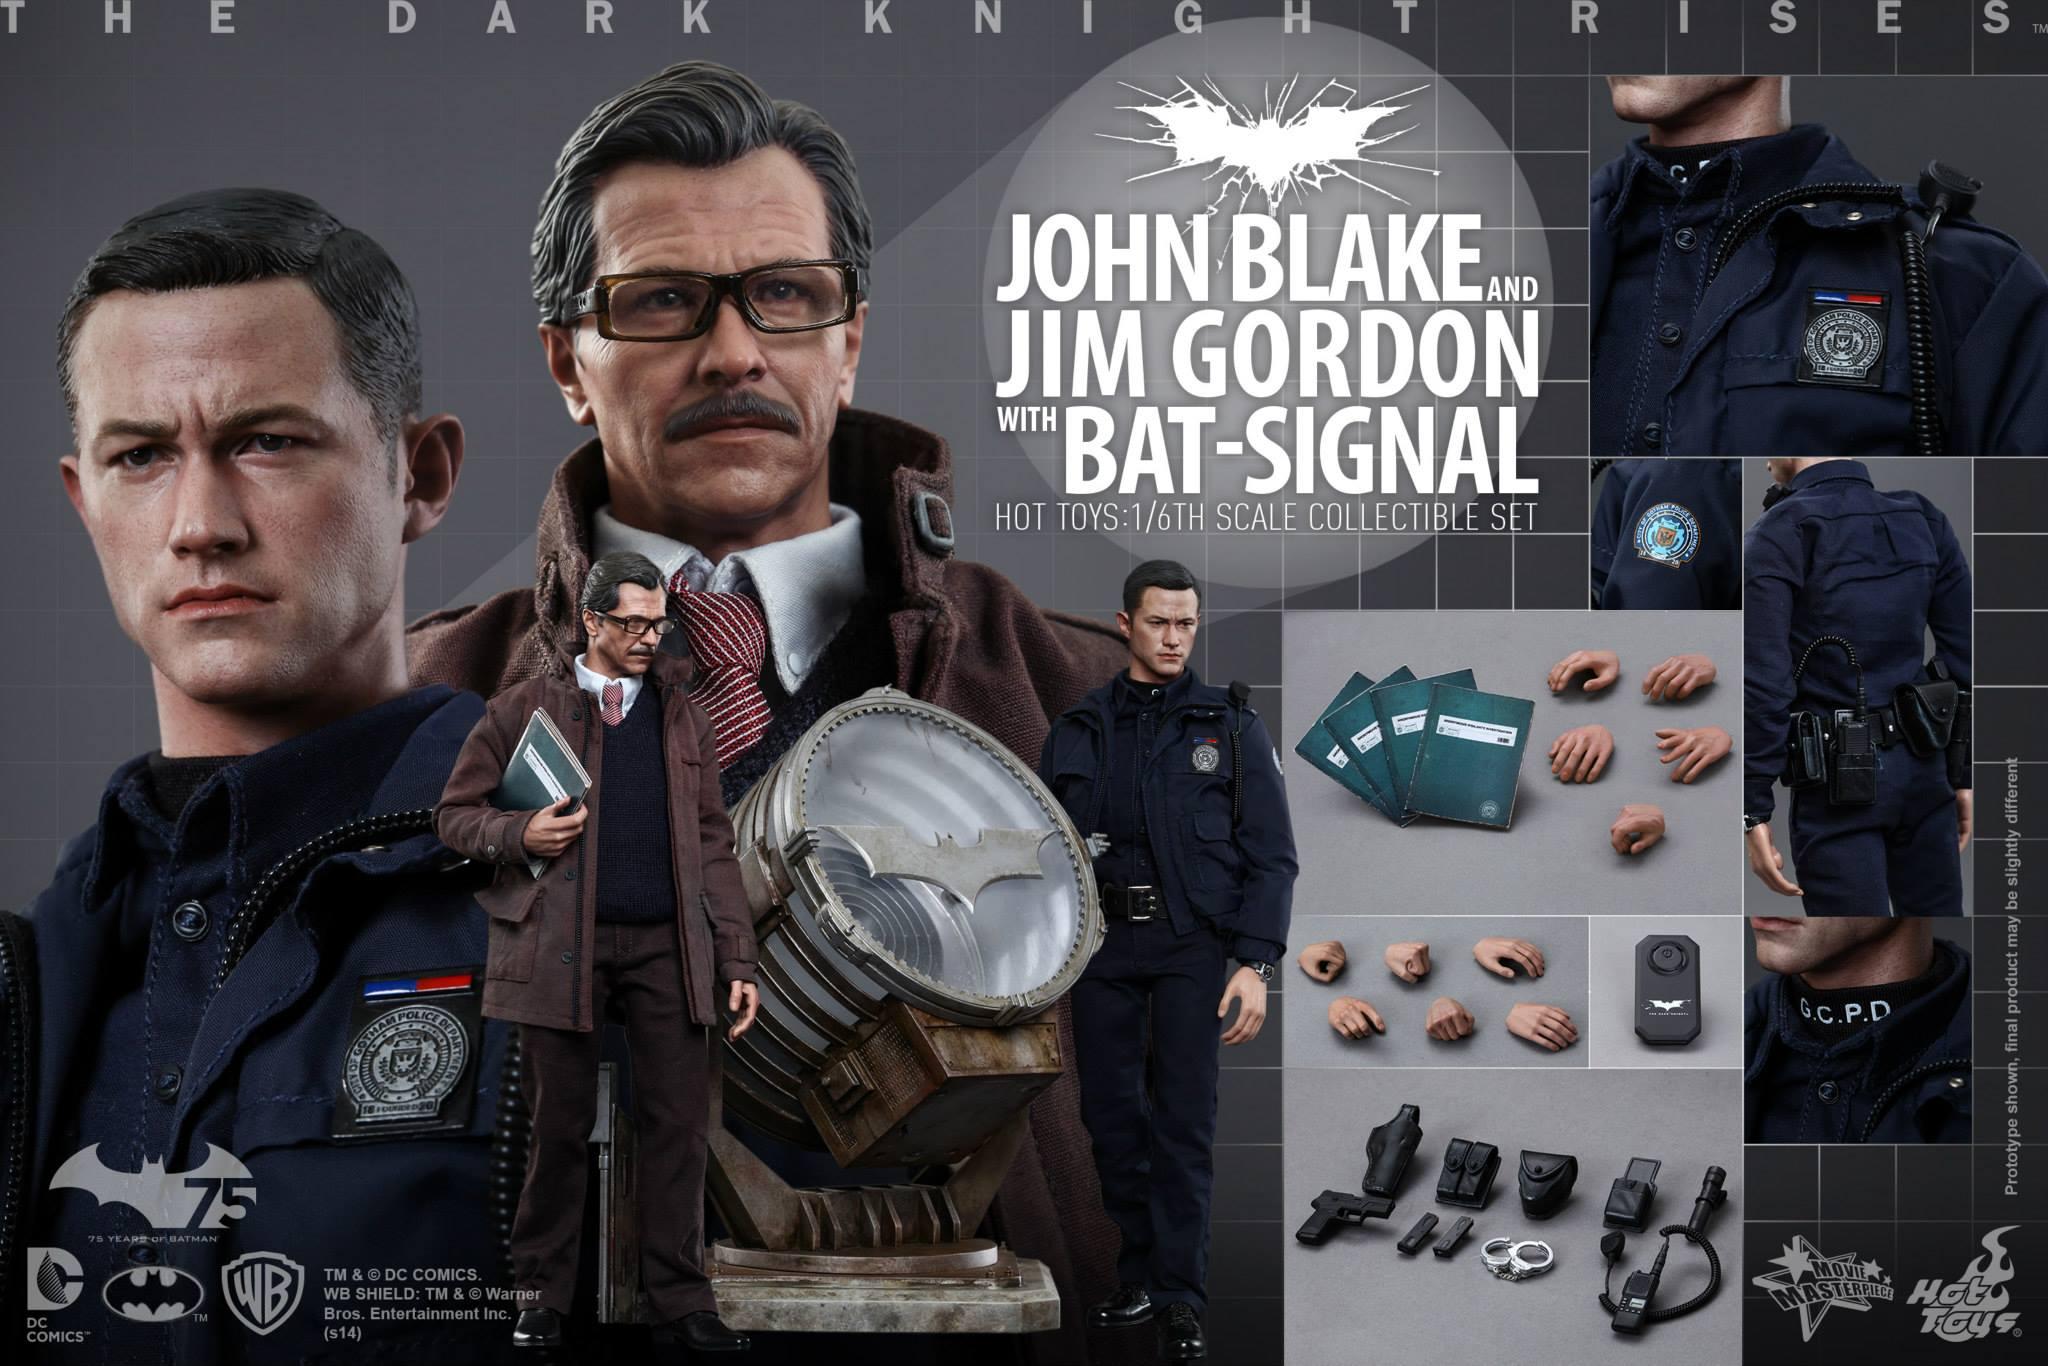 THE DARK KNIGHT RISES - Lt. JIM GORDON & JOHN BLAKE w/BATSIGNAL 807825110